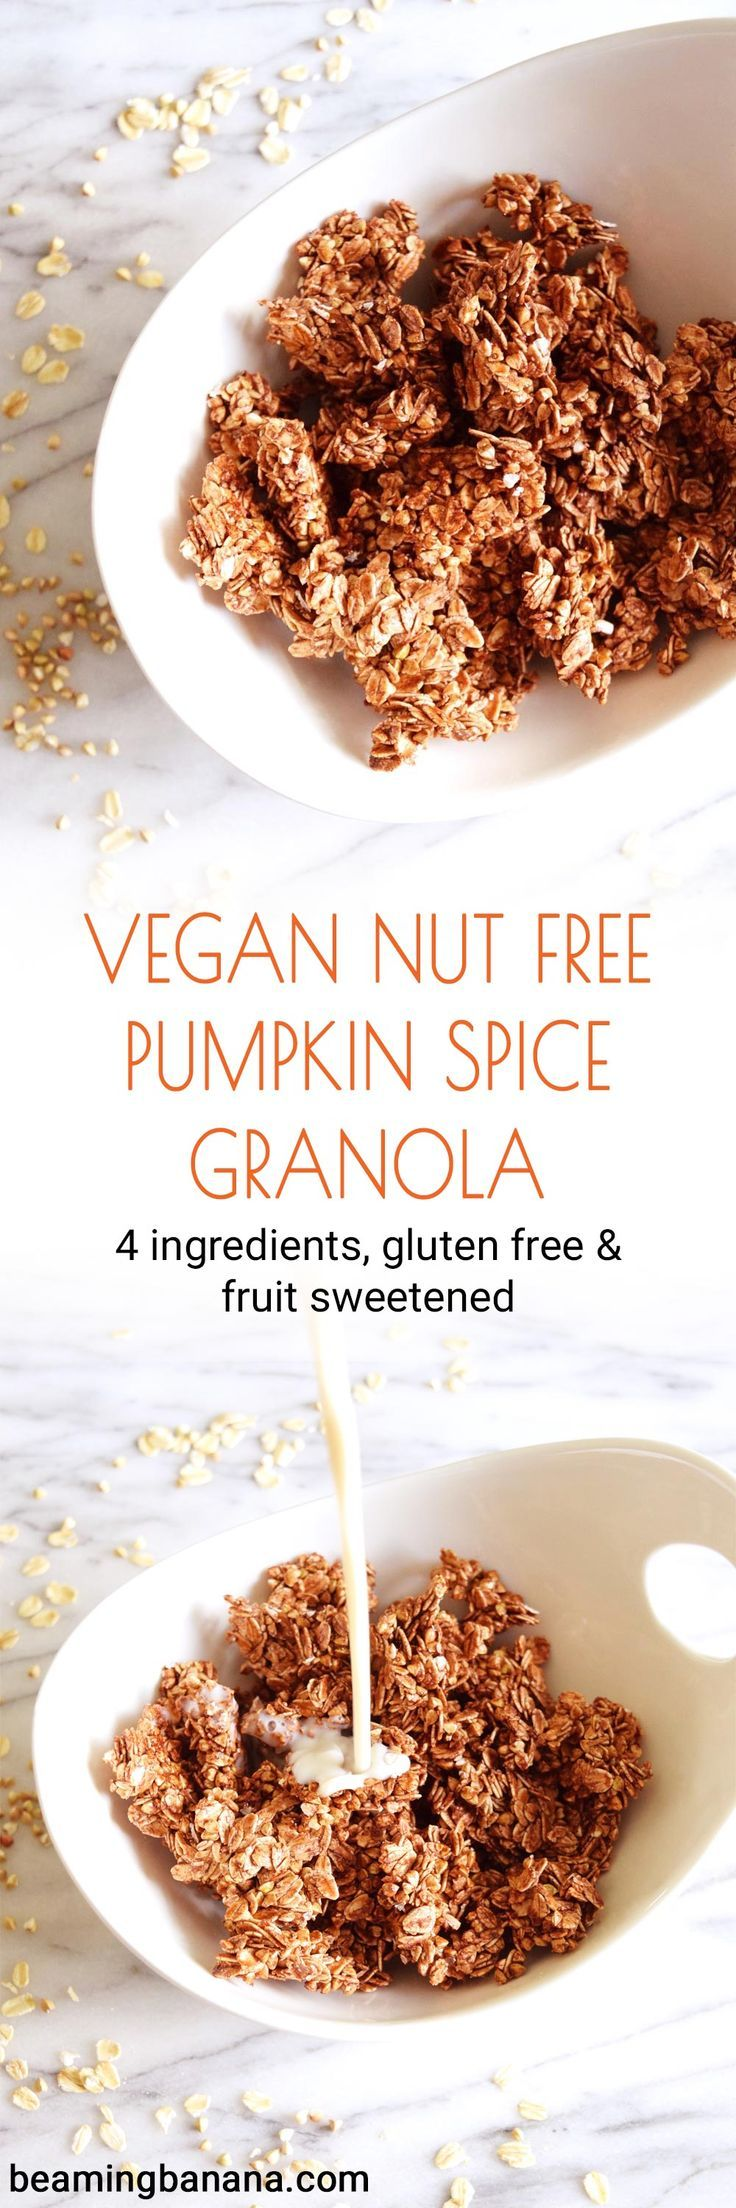 Vegan Nut Free Pumpkin Spice Granola